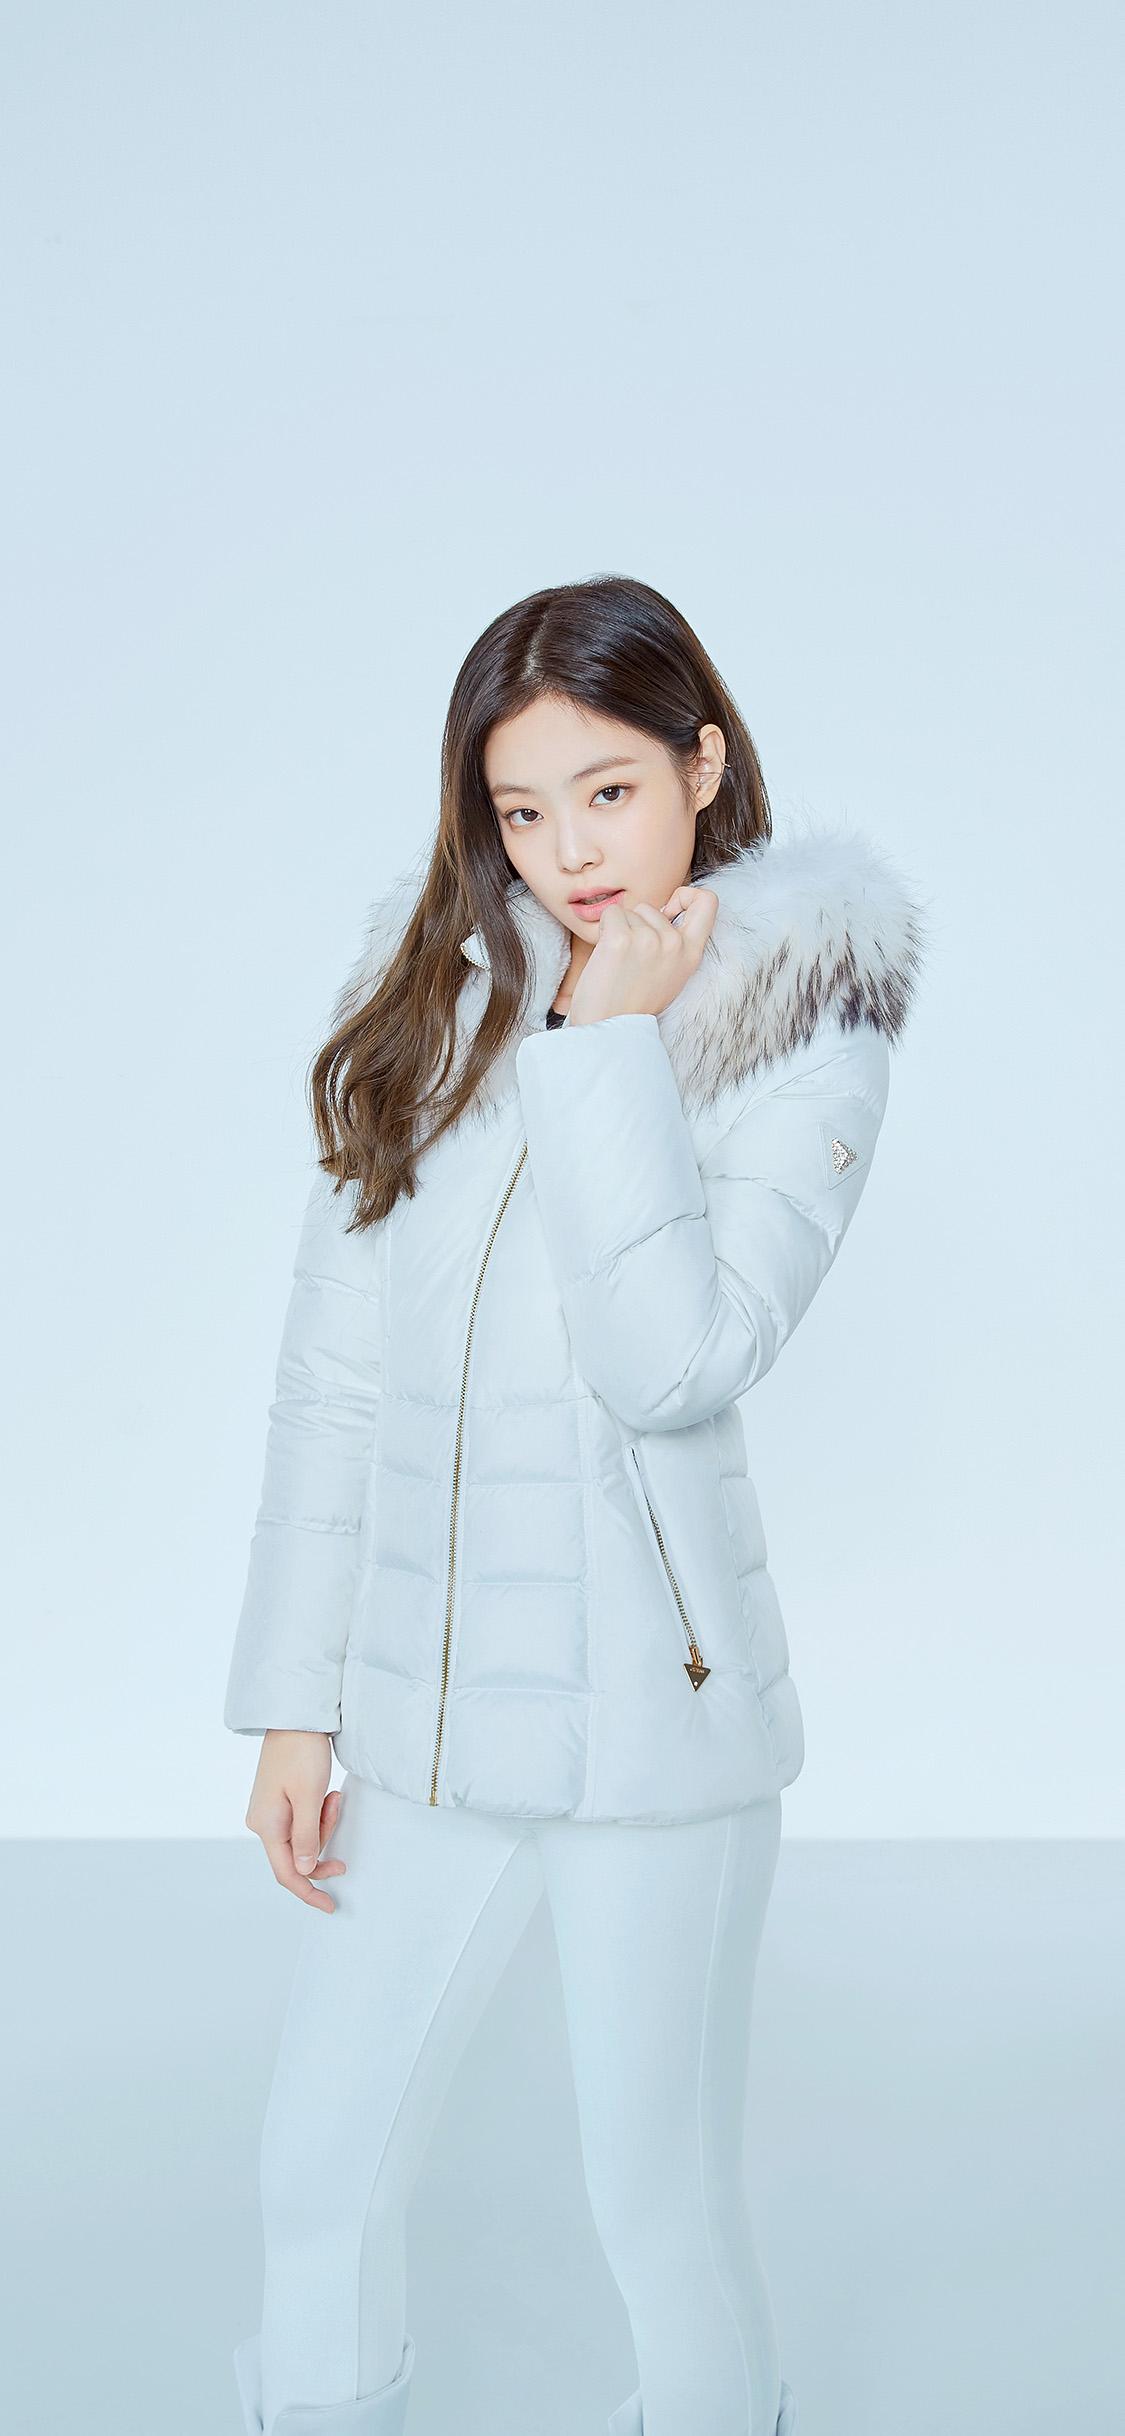 iPhonexpapers.com-Apple-iPhone-wallpaper-hr47-kpop-jennie-solo-winter-music-girl